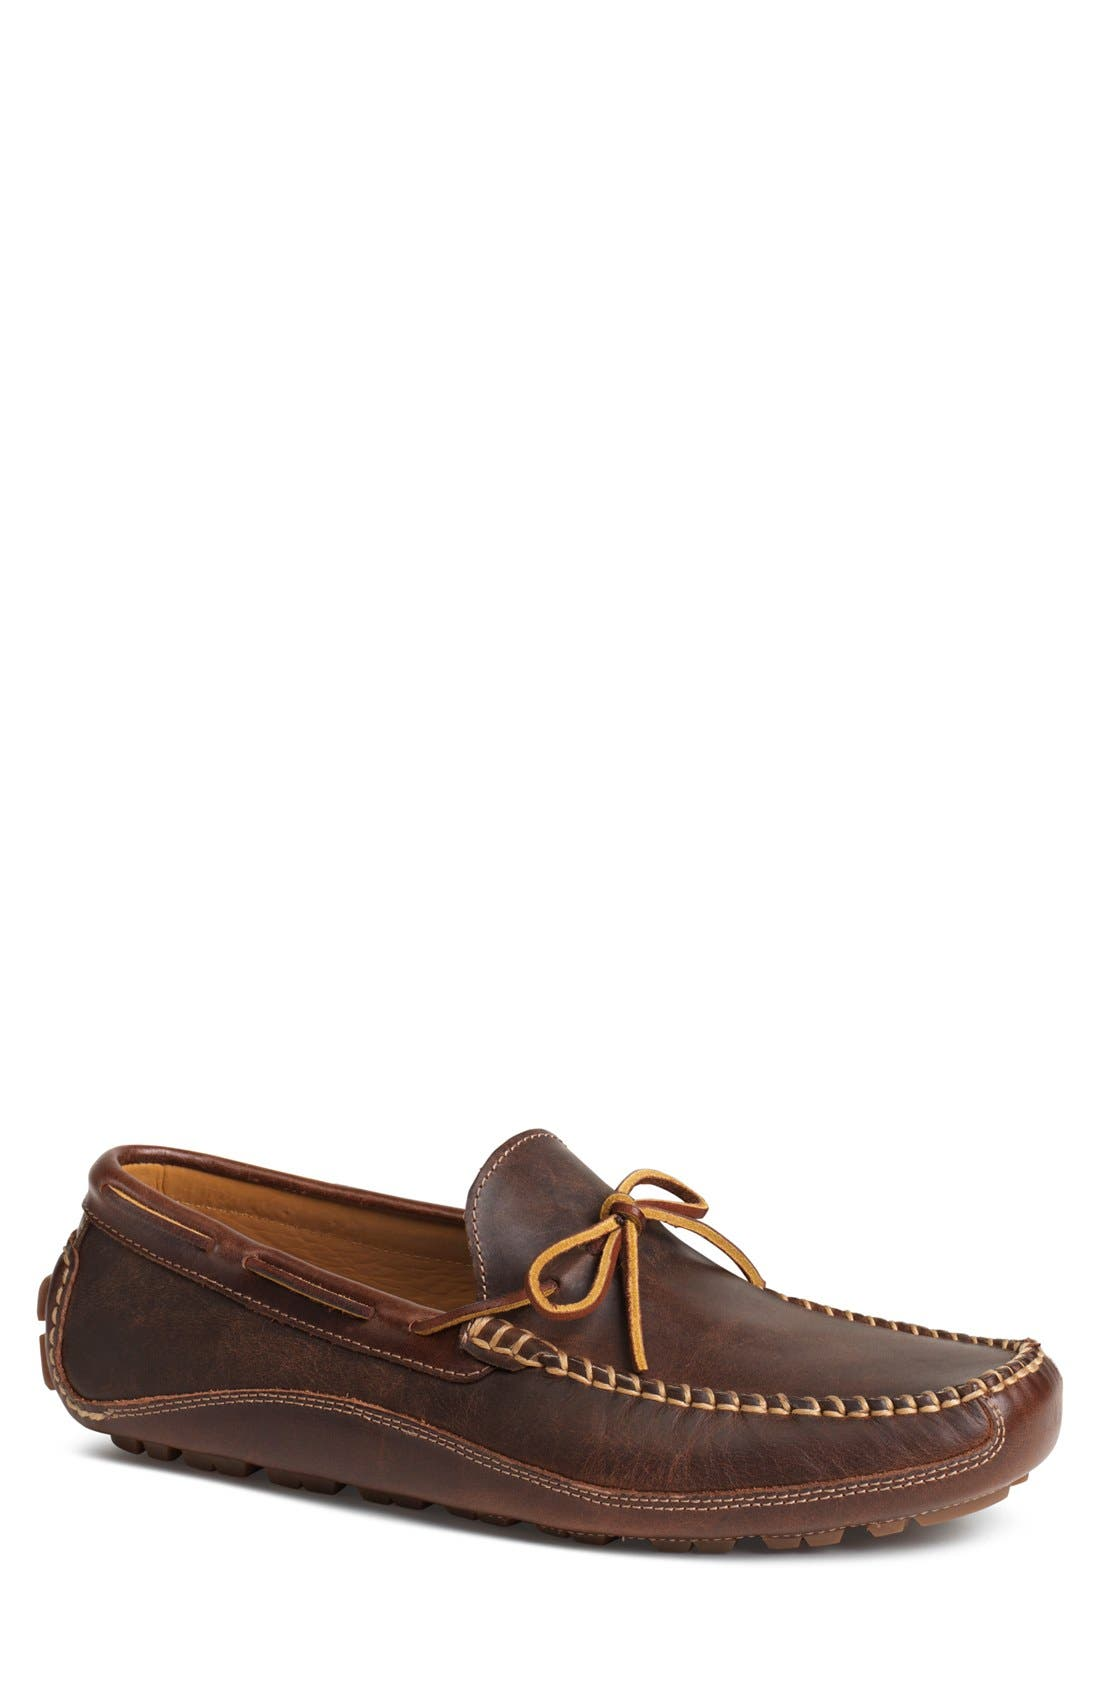 Main Image - Trask 'Drake' Leather Driving Shoe